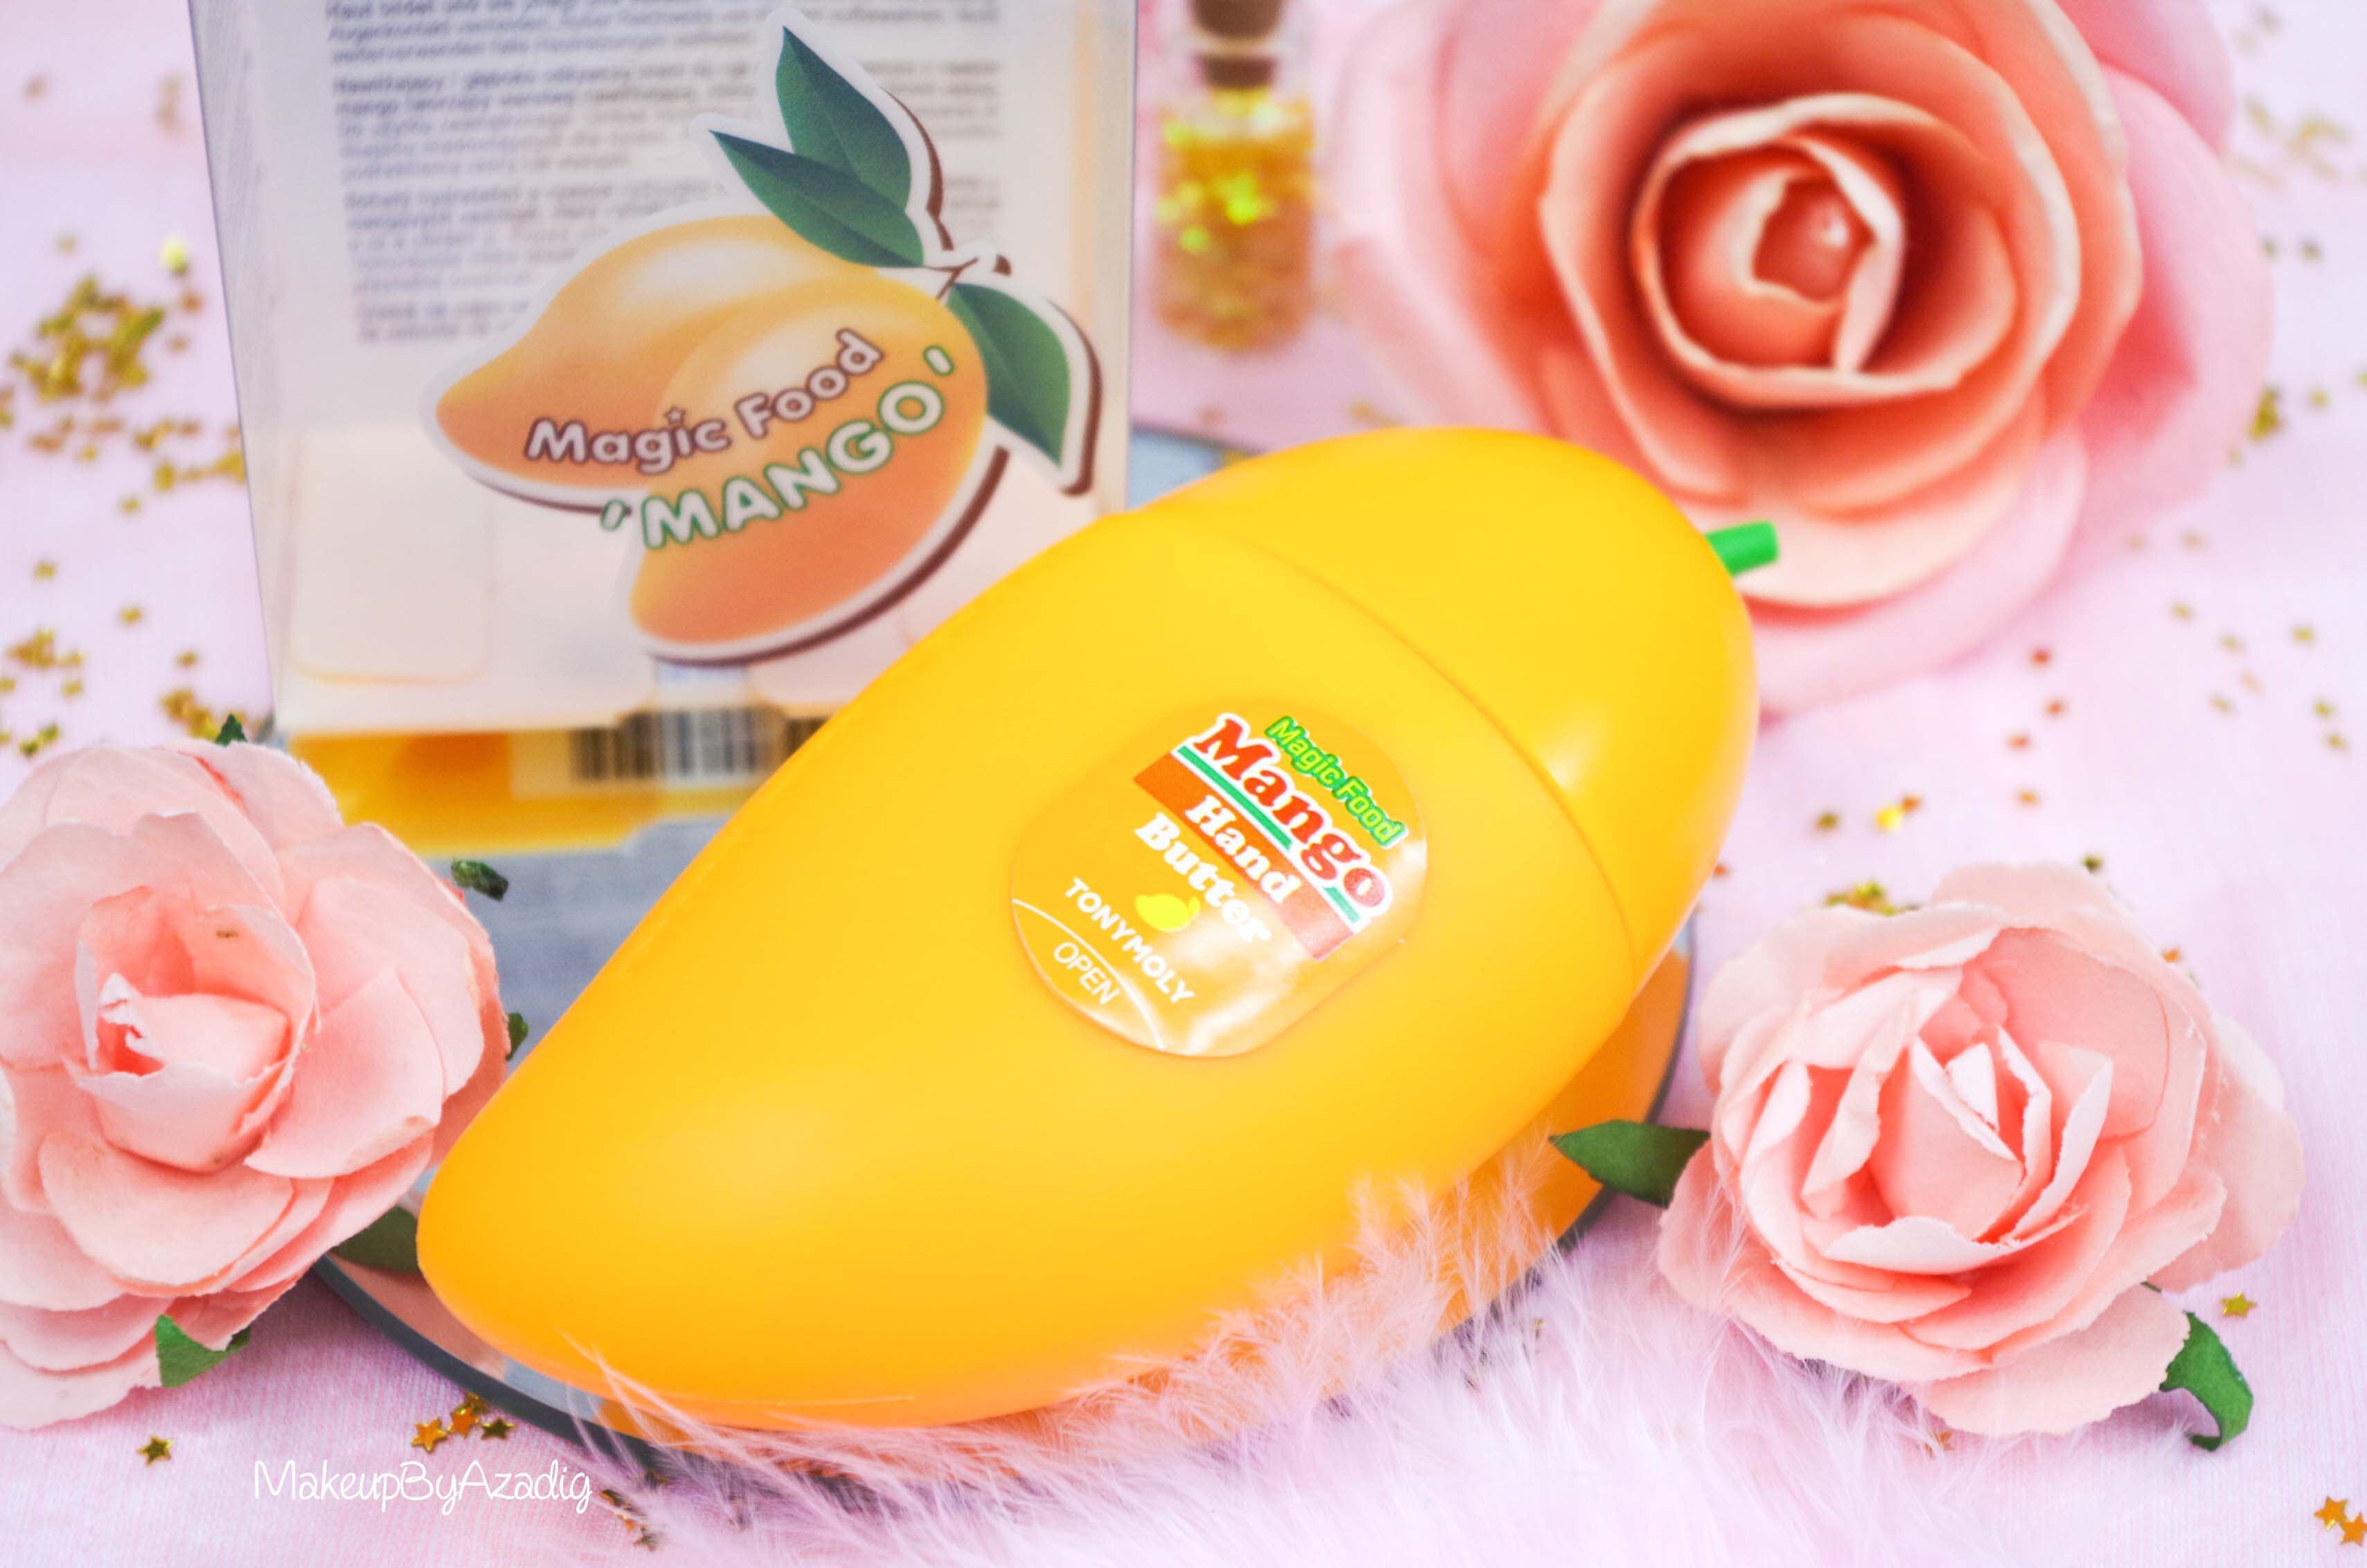 miniature-creme-mains-mango-hand-butter-tonymoly-sephora-france-cocooning-revue-avis-prix-makeupbyazadig-influencer